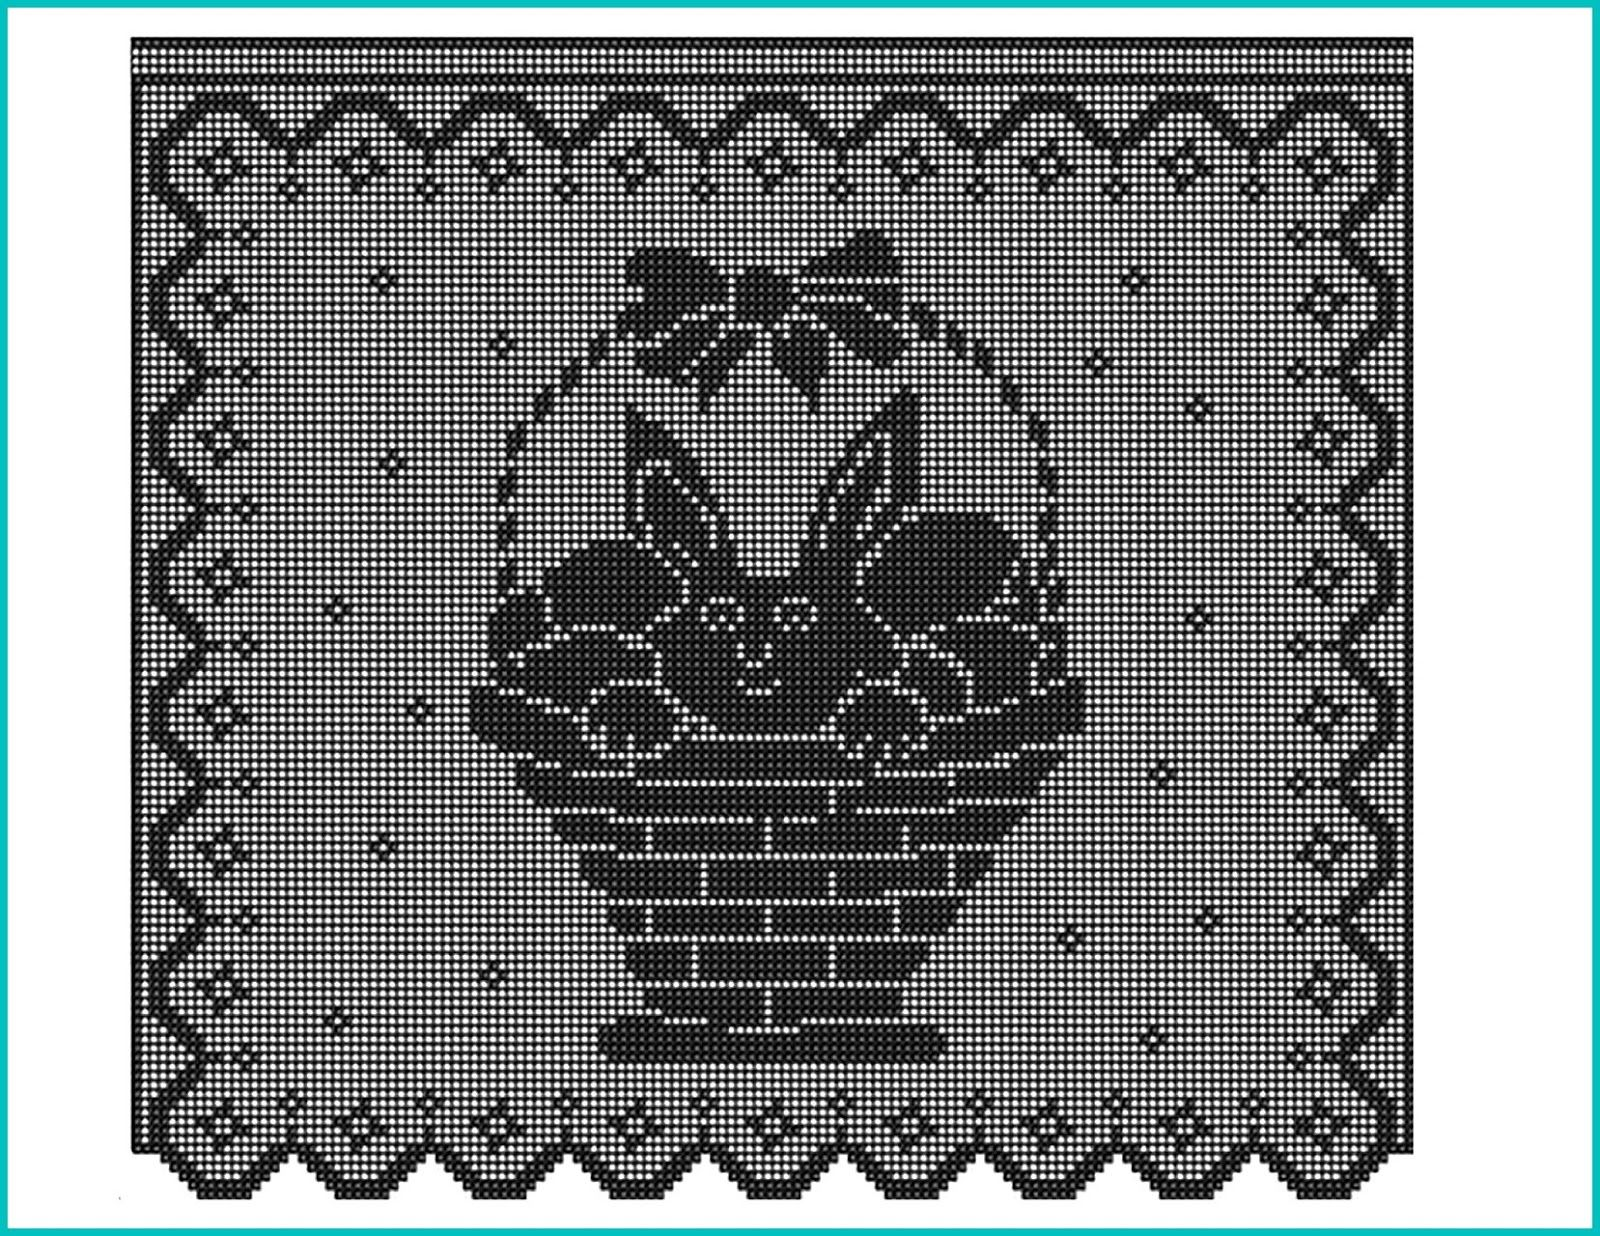 Pin by interszansa on ZAA crochet- filet (scieg siatkowy ) | Pinterest